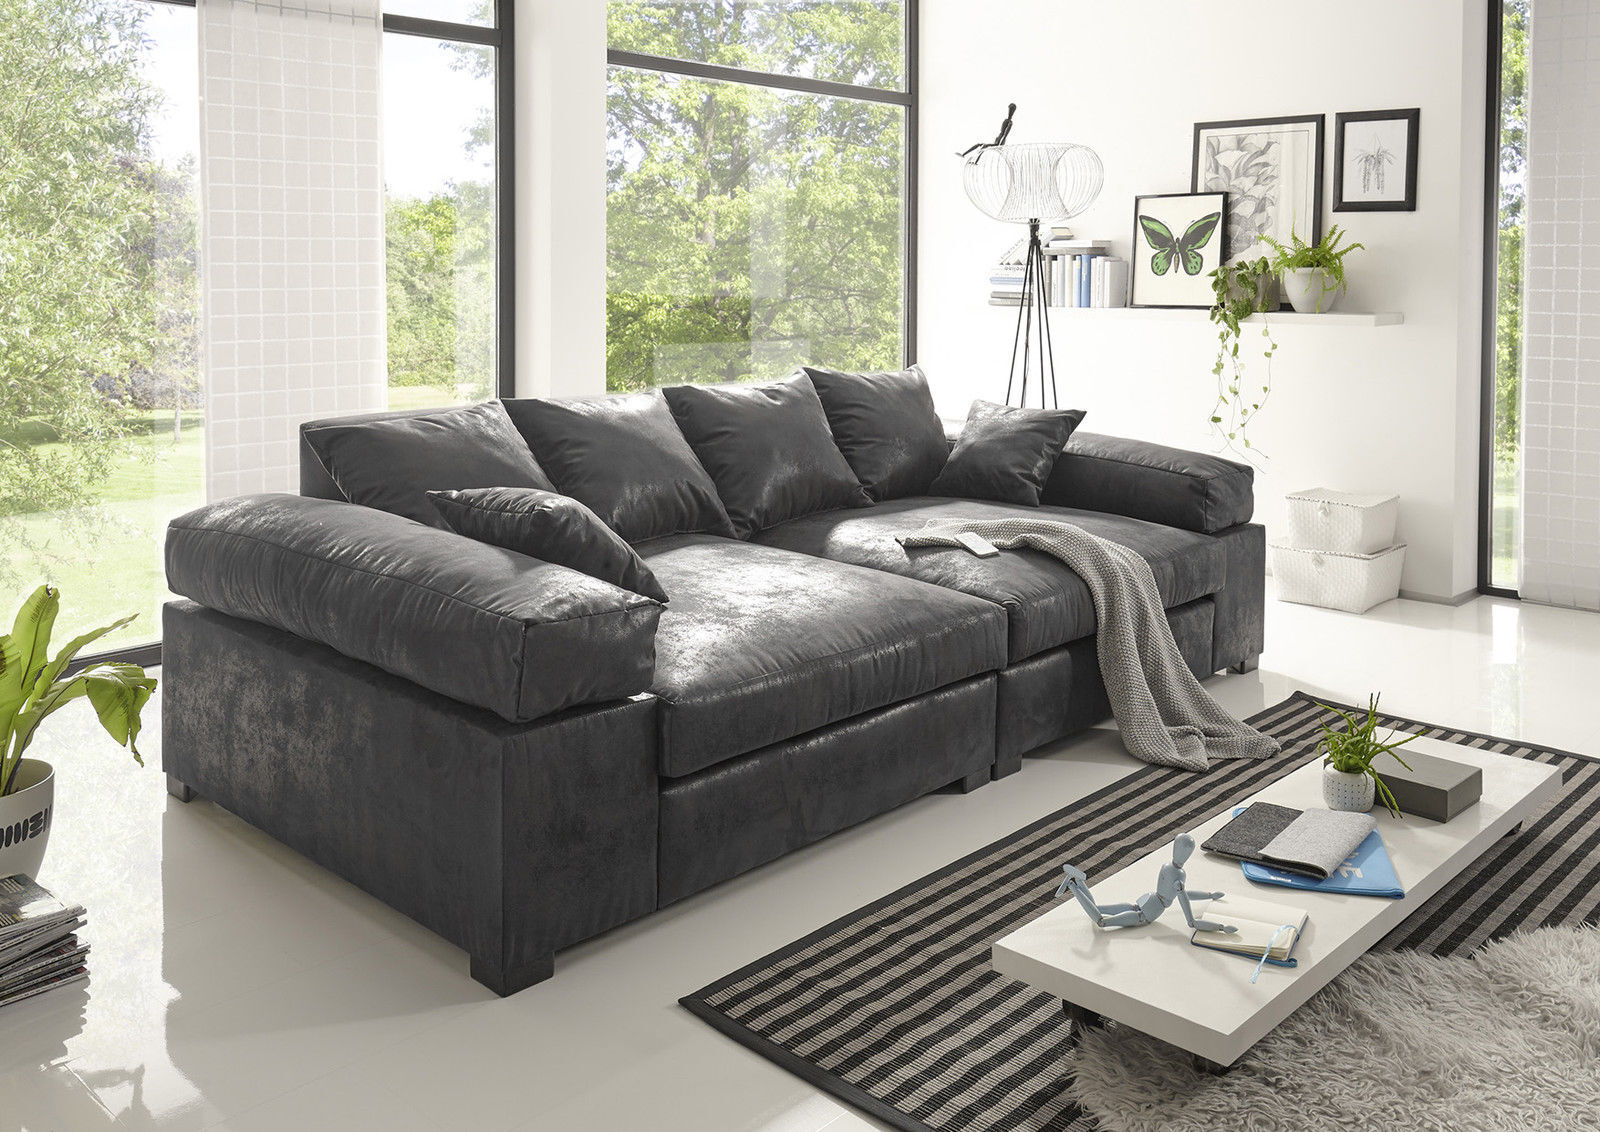 Big Sofa Couchgarnitur Megasofa Riesensofa  Polstergarnitur XXL Vintage.